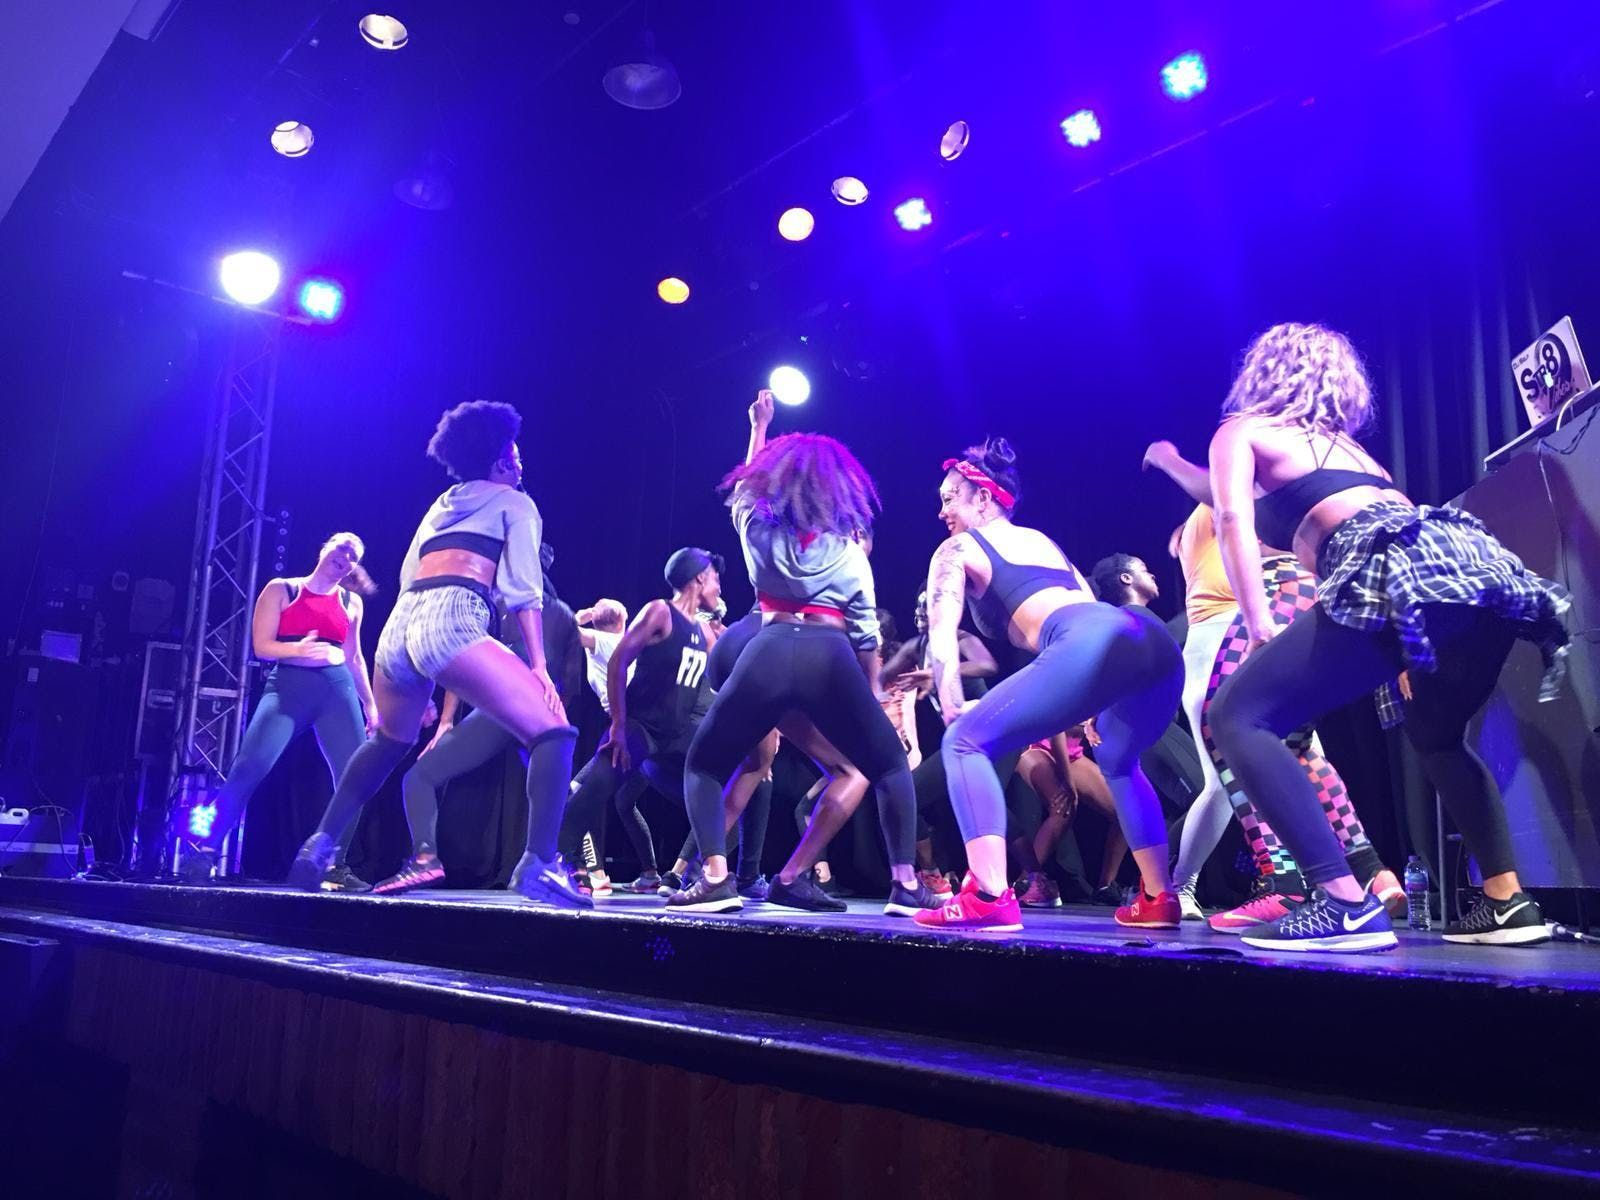 Soca vs. Dancehall Twerk n Whine Masterclass Amsterdam